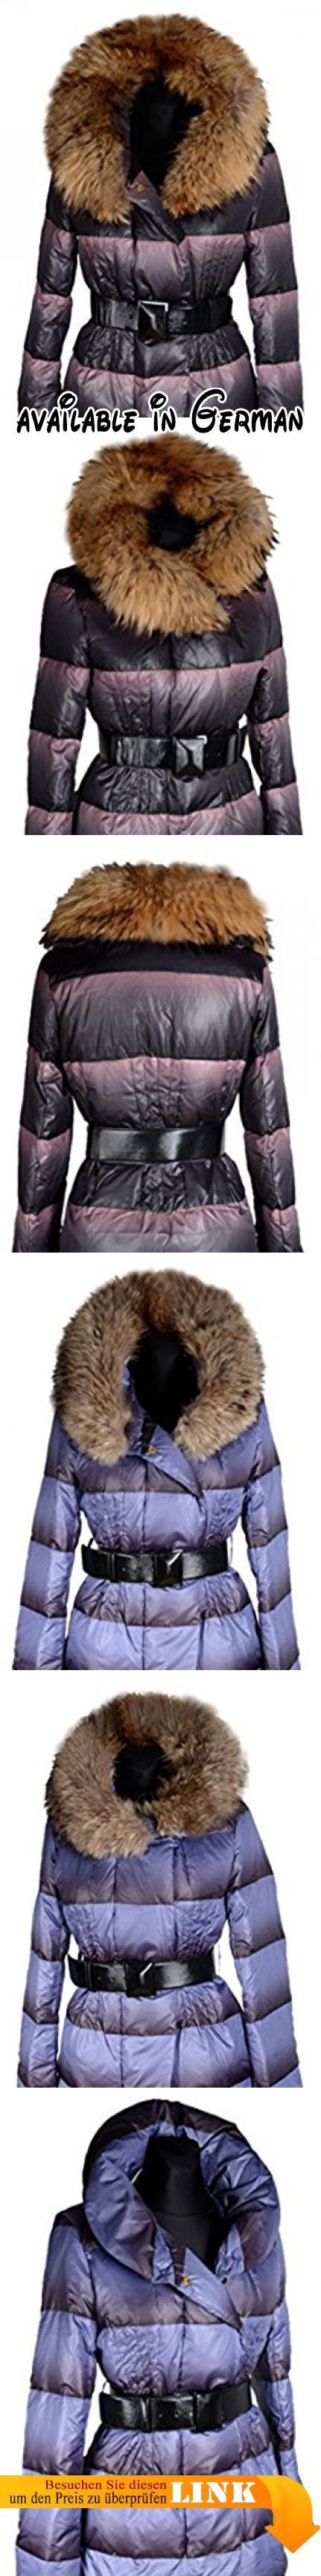 B077RMQQZL : Damen echt Daunen Jacke XXL Raccoon Fell Kragen Winter Jacke Parka Mantel warm GEFÜTTERT 36 38 40 42 S M L Blau Anorak Daunenjacke Daunenmantel (42).